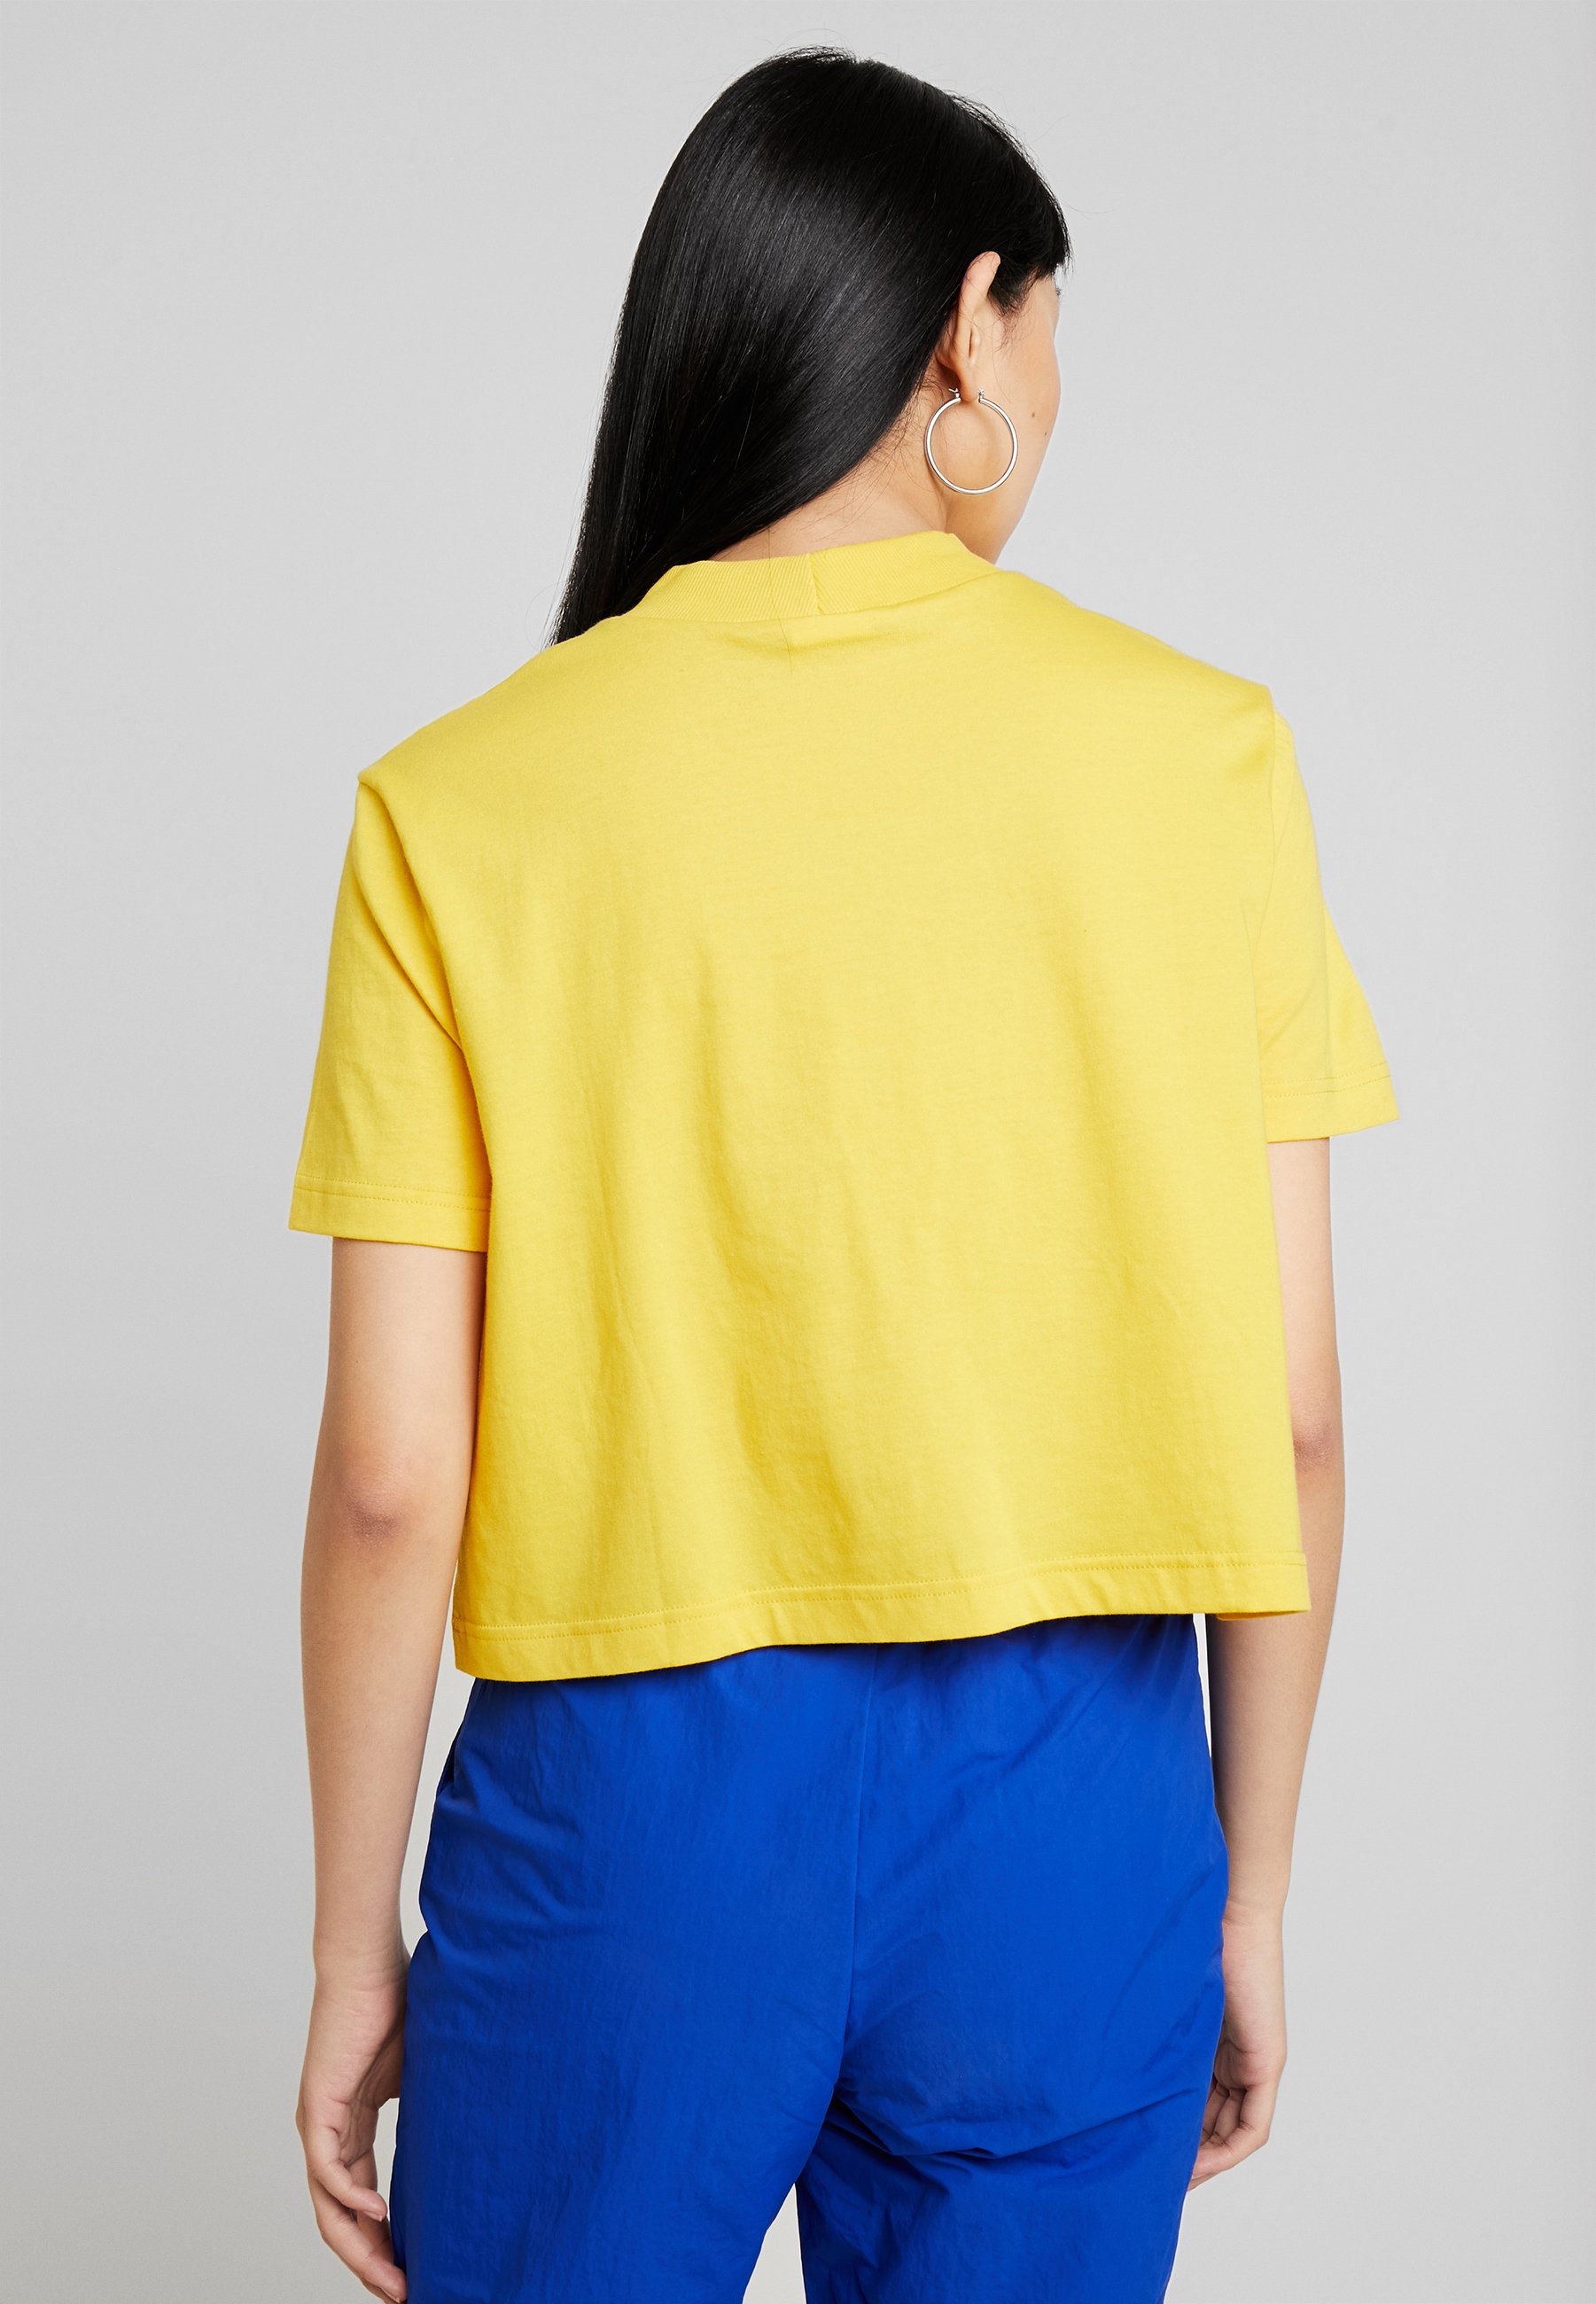 TeeT shirt Classic Reebok Toxic Imprimé Cropeed Yellow tChrdxsQ